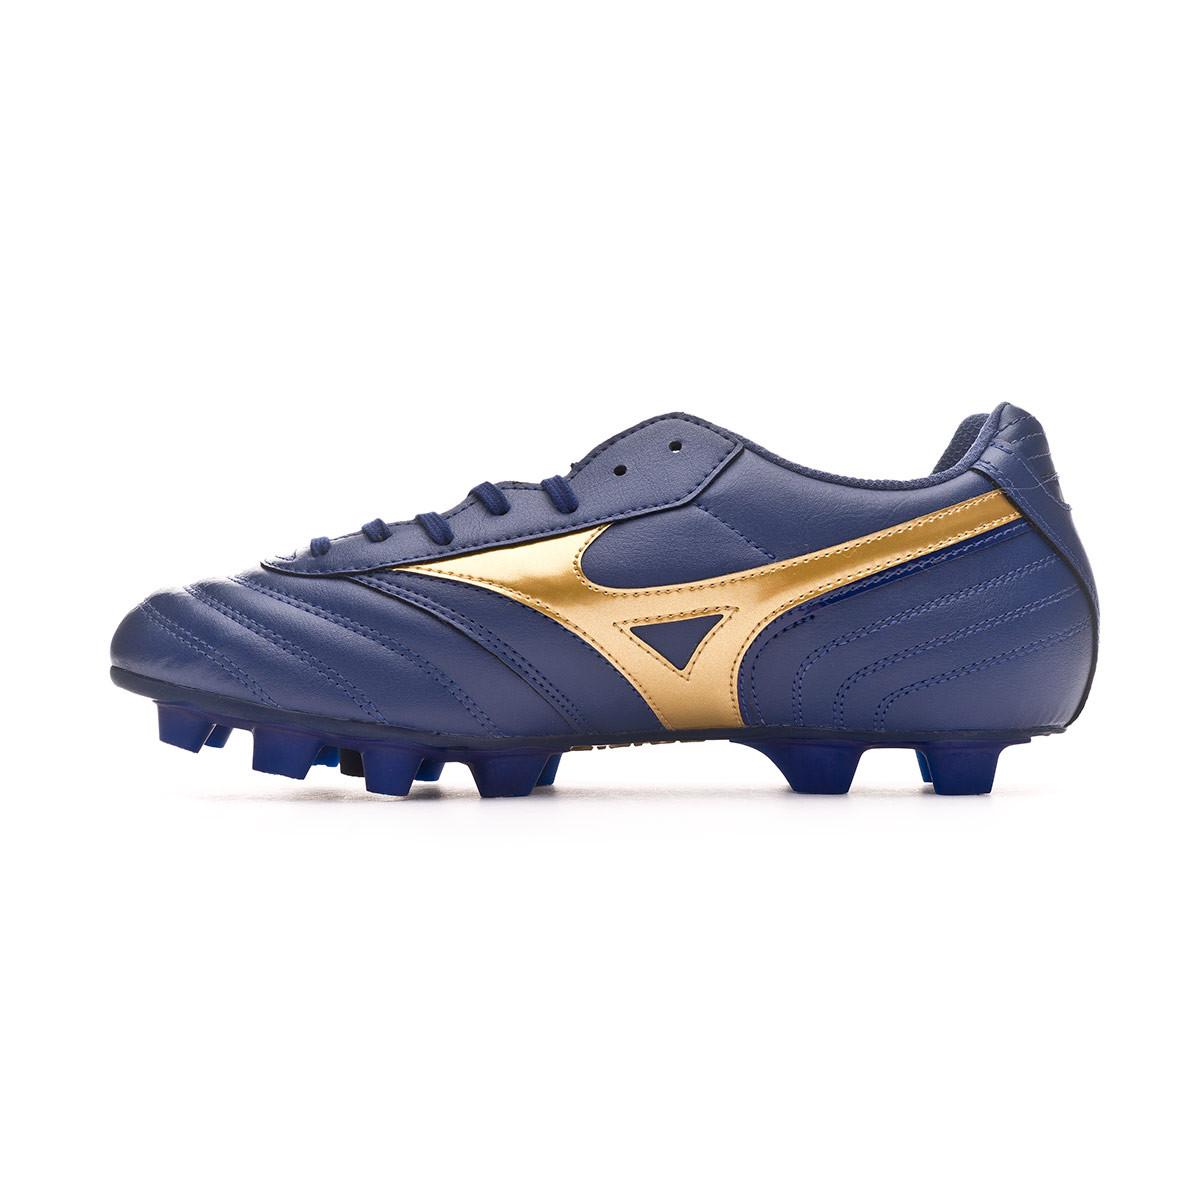 acheter pas cher style attrayant comment commander Chaussure de foot Mizuno MRL Club MD